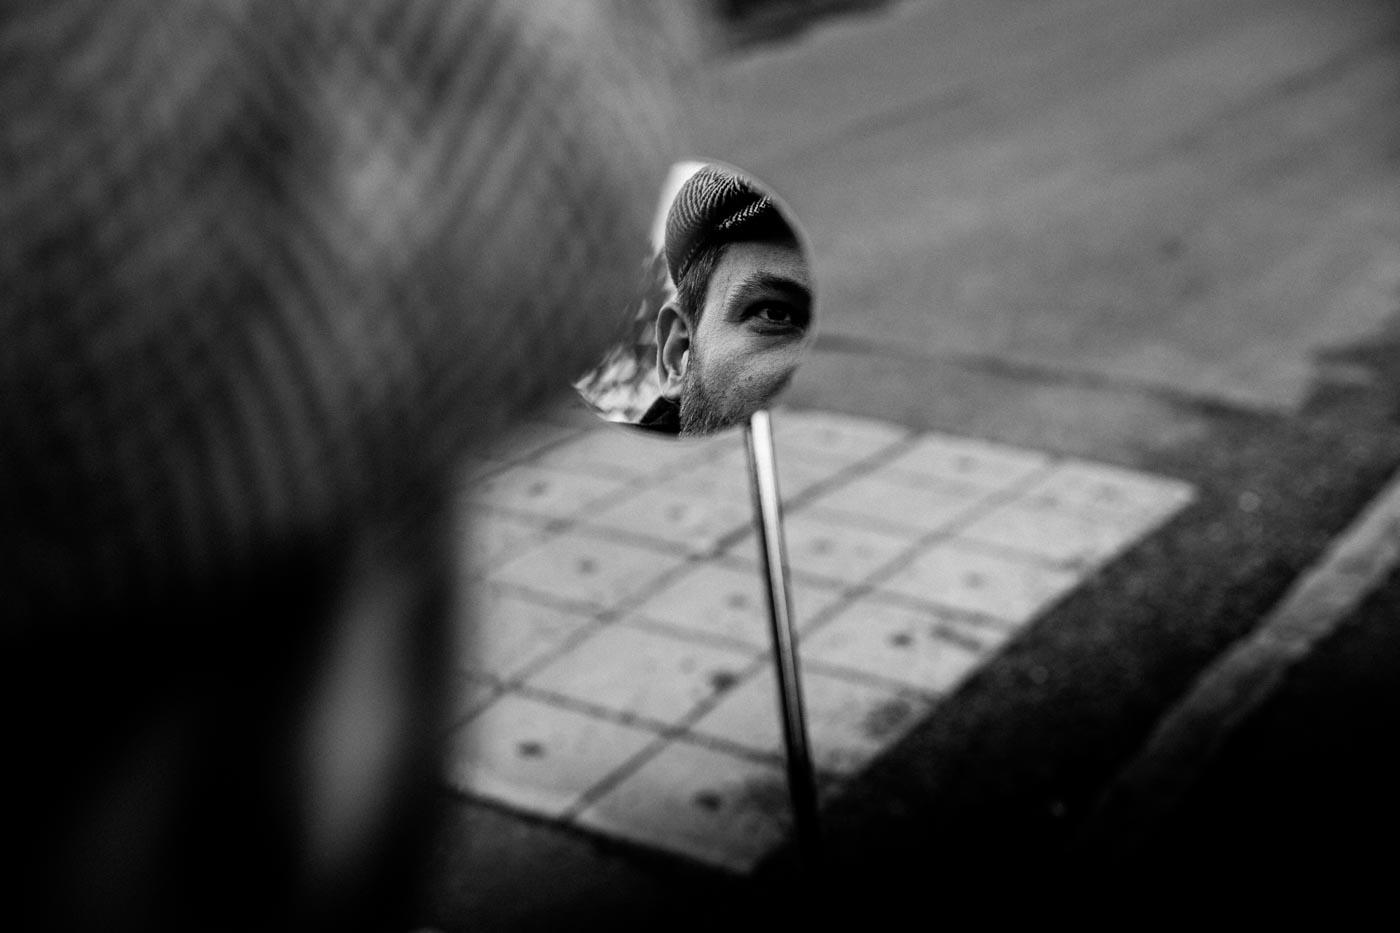 Black & White Photography_Man I © Alan Thomas Duncan Wilkie-1-2.jpg